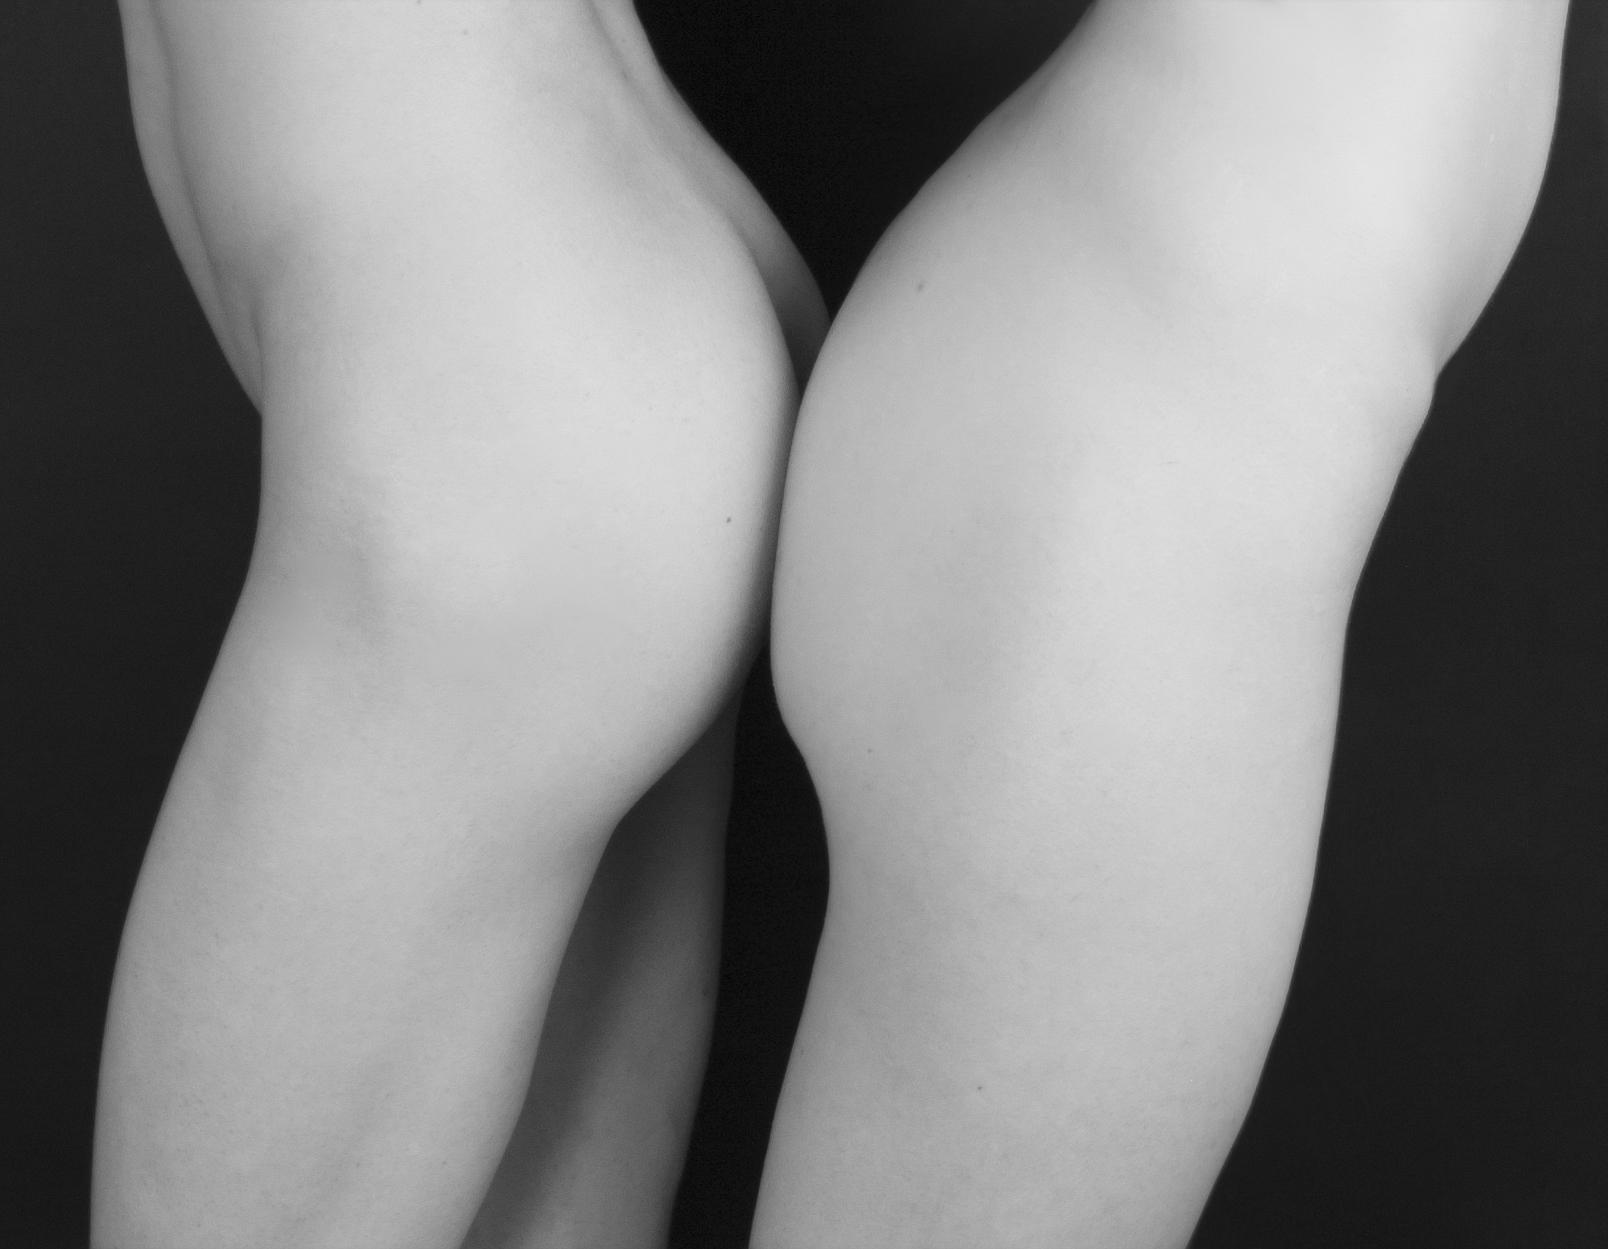 ANDROGYNY nudes, 2013: oldmh.curry.com/portfolioartlink/androgynynudes2013